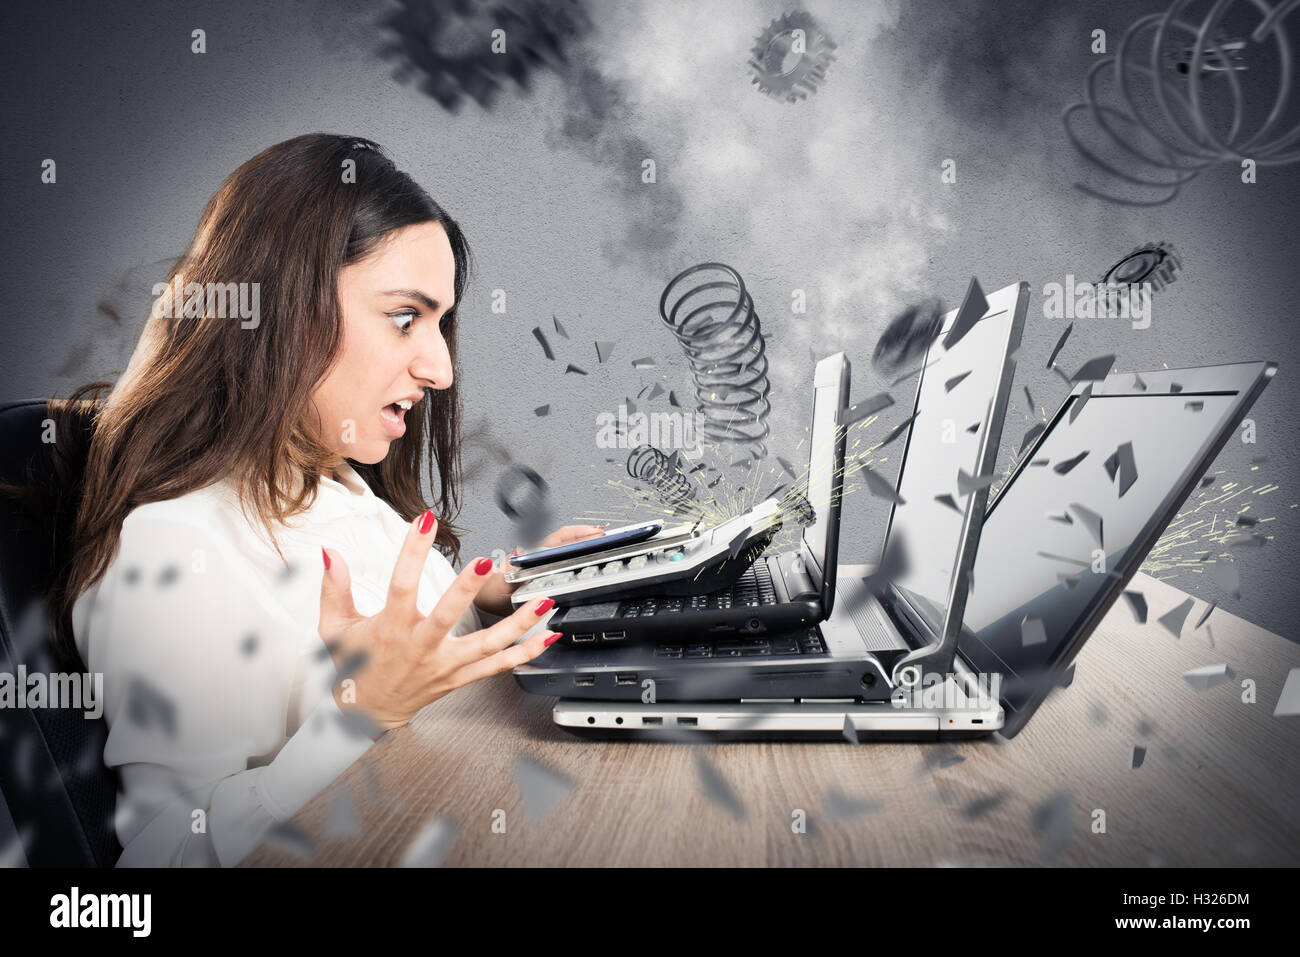 Businesswoman overworked worn computers - Stock Image